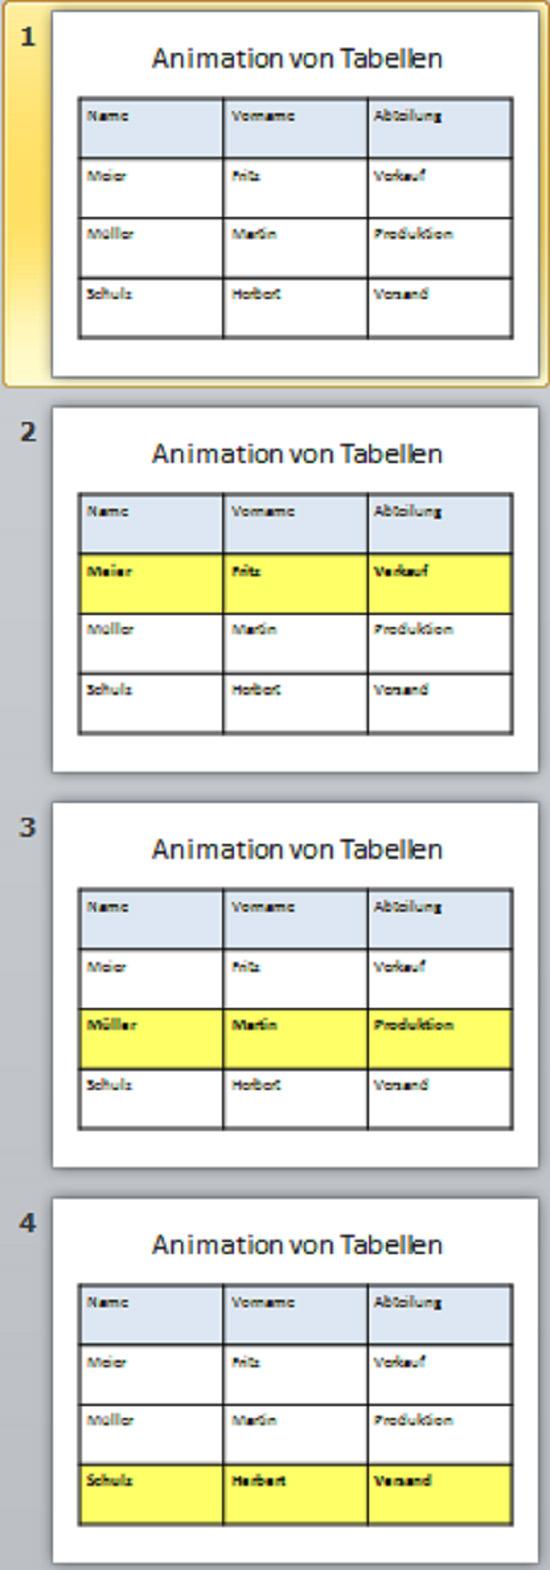 owerPoint Tabellen animieren